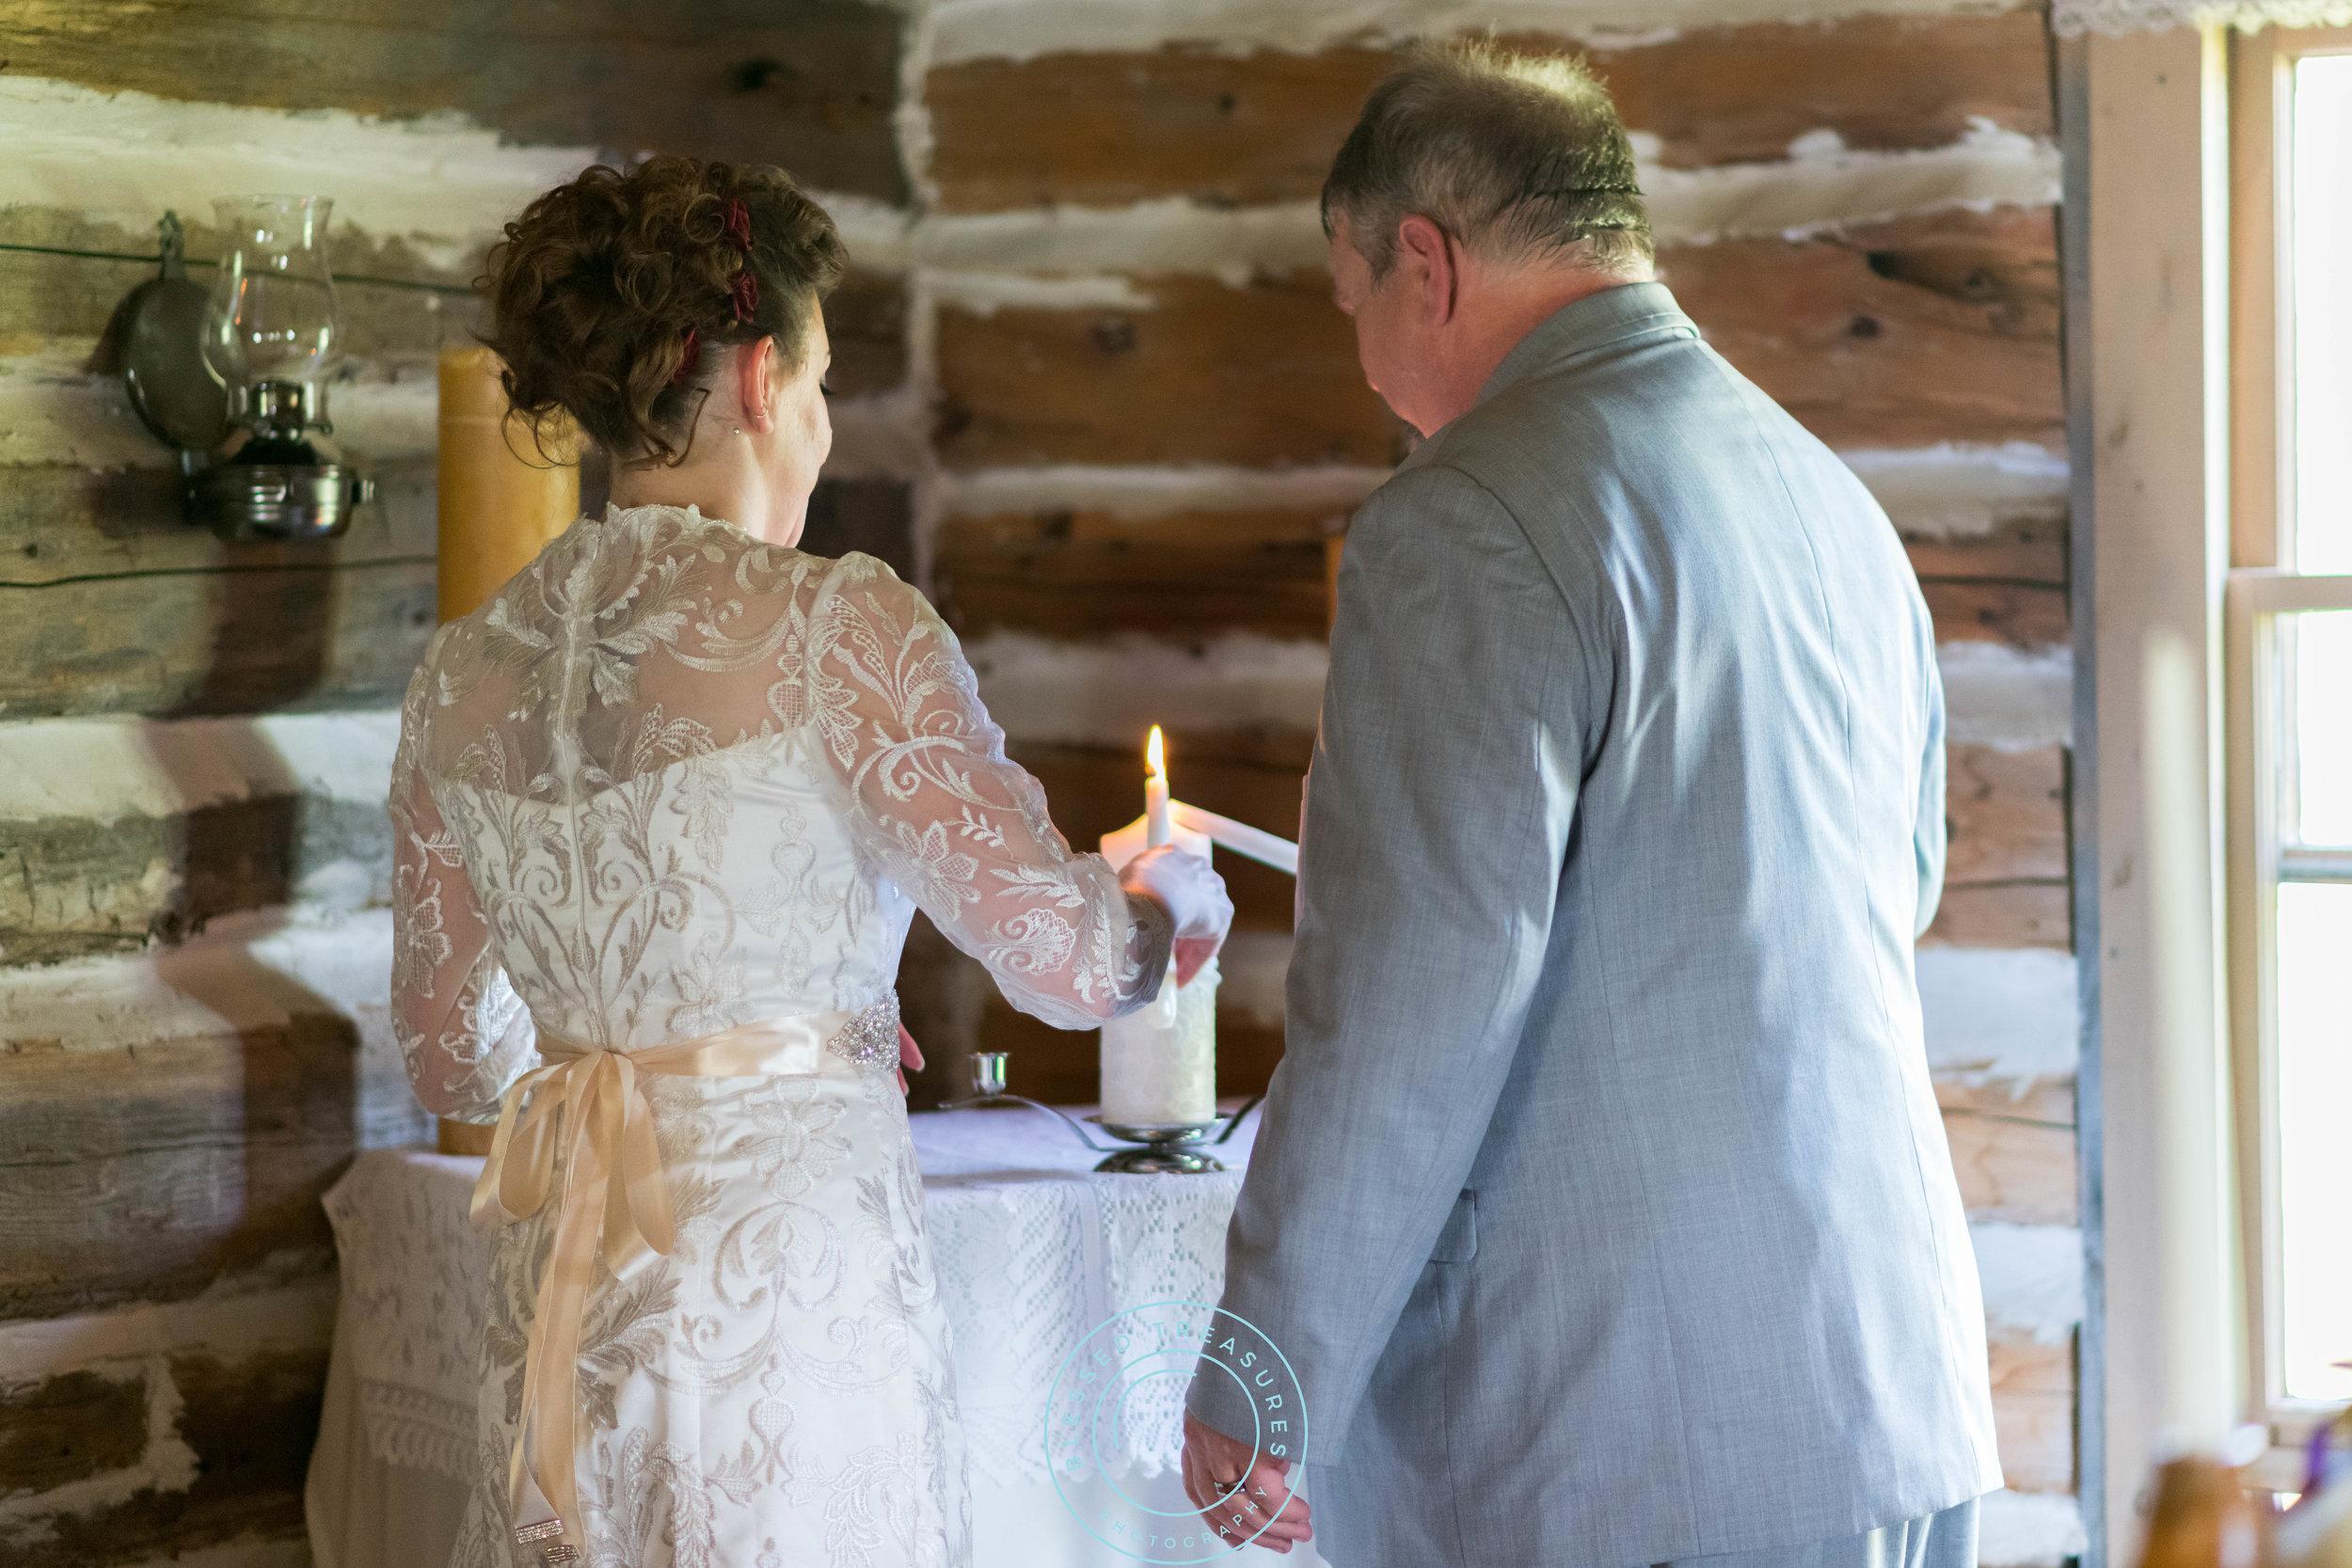 Mansfield township pioneer church crystal falls michigan bride and groom wedding ceremony unity candle diamond pearl broach